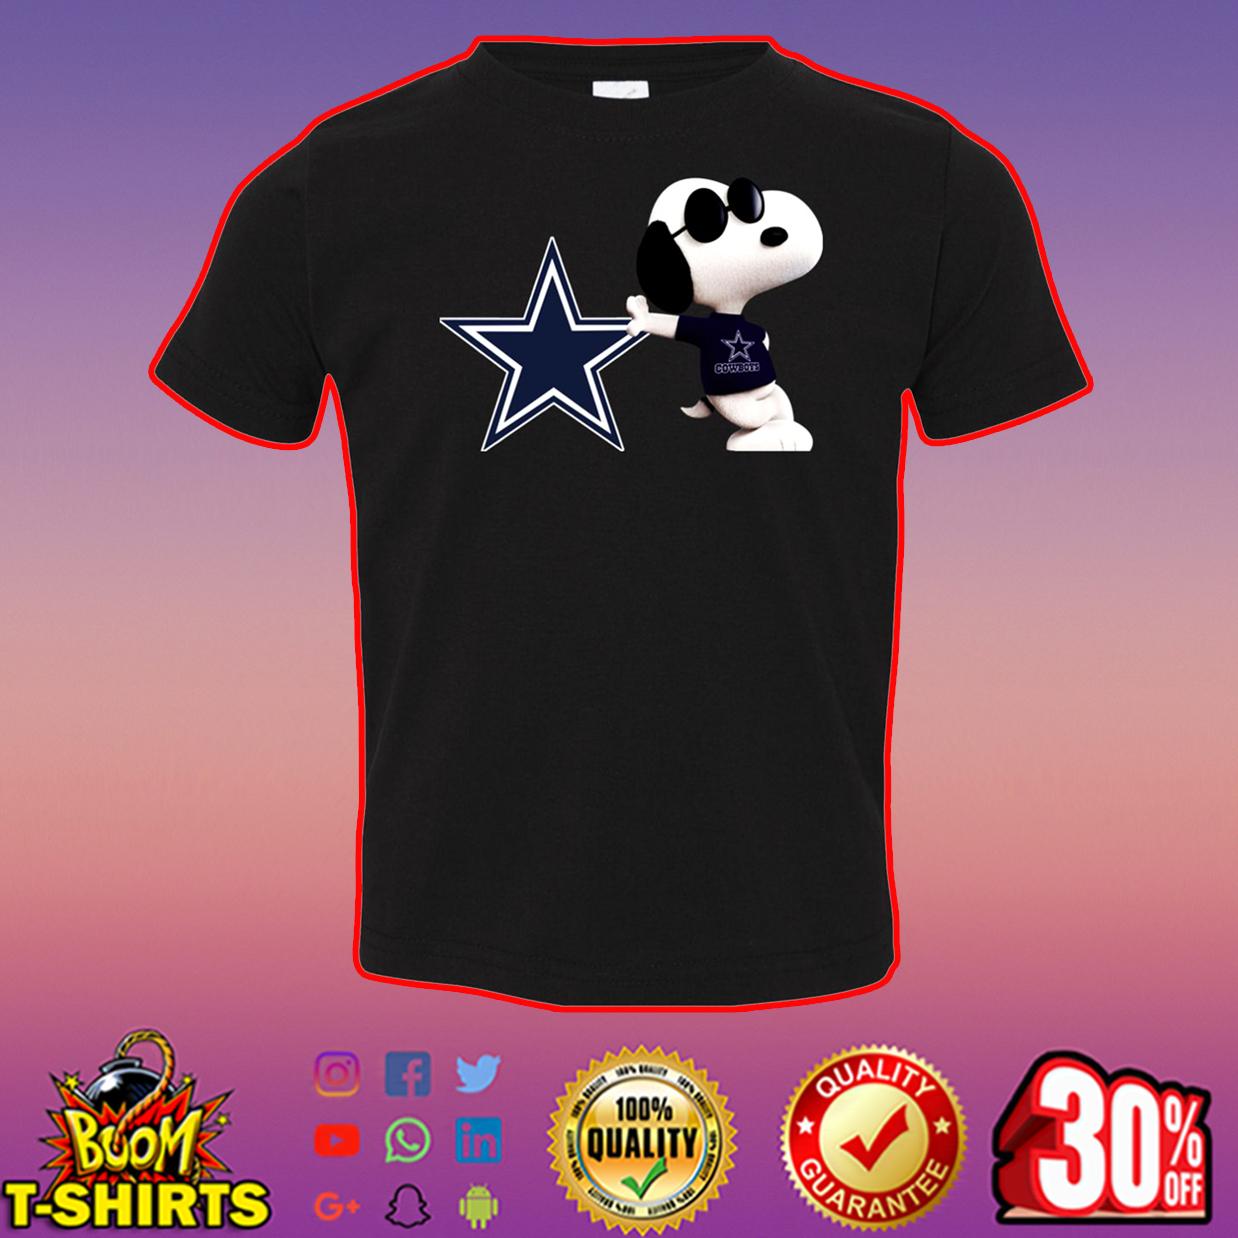 Snoopy dallas cowboys t-shirt - black